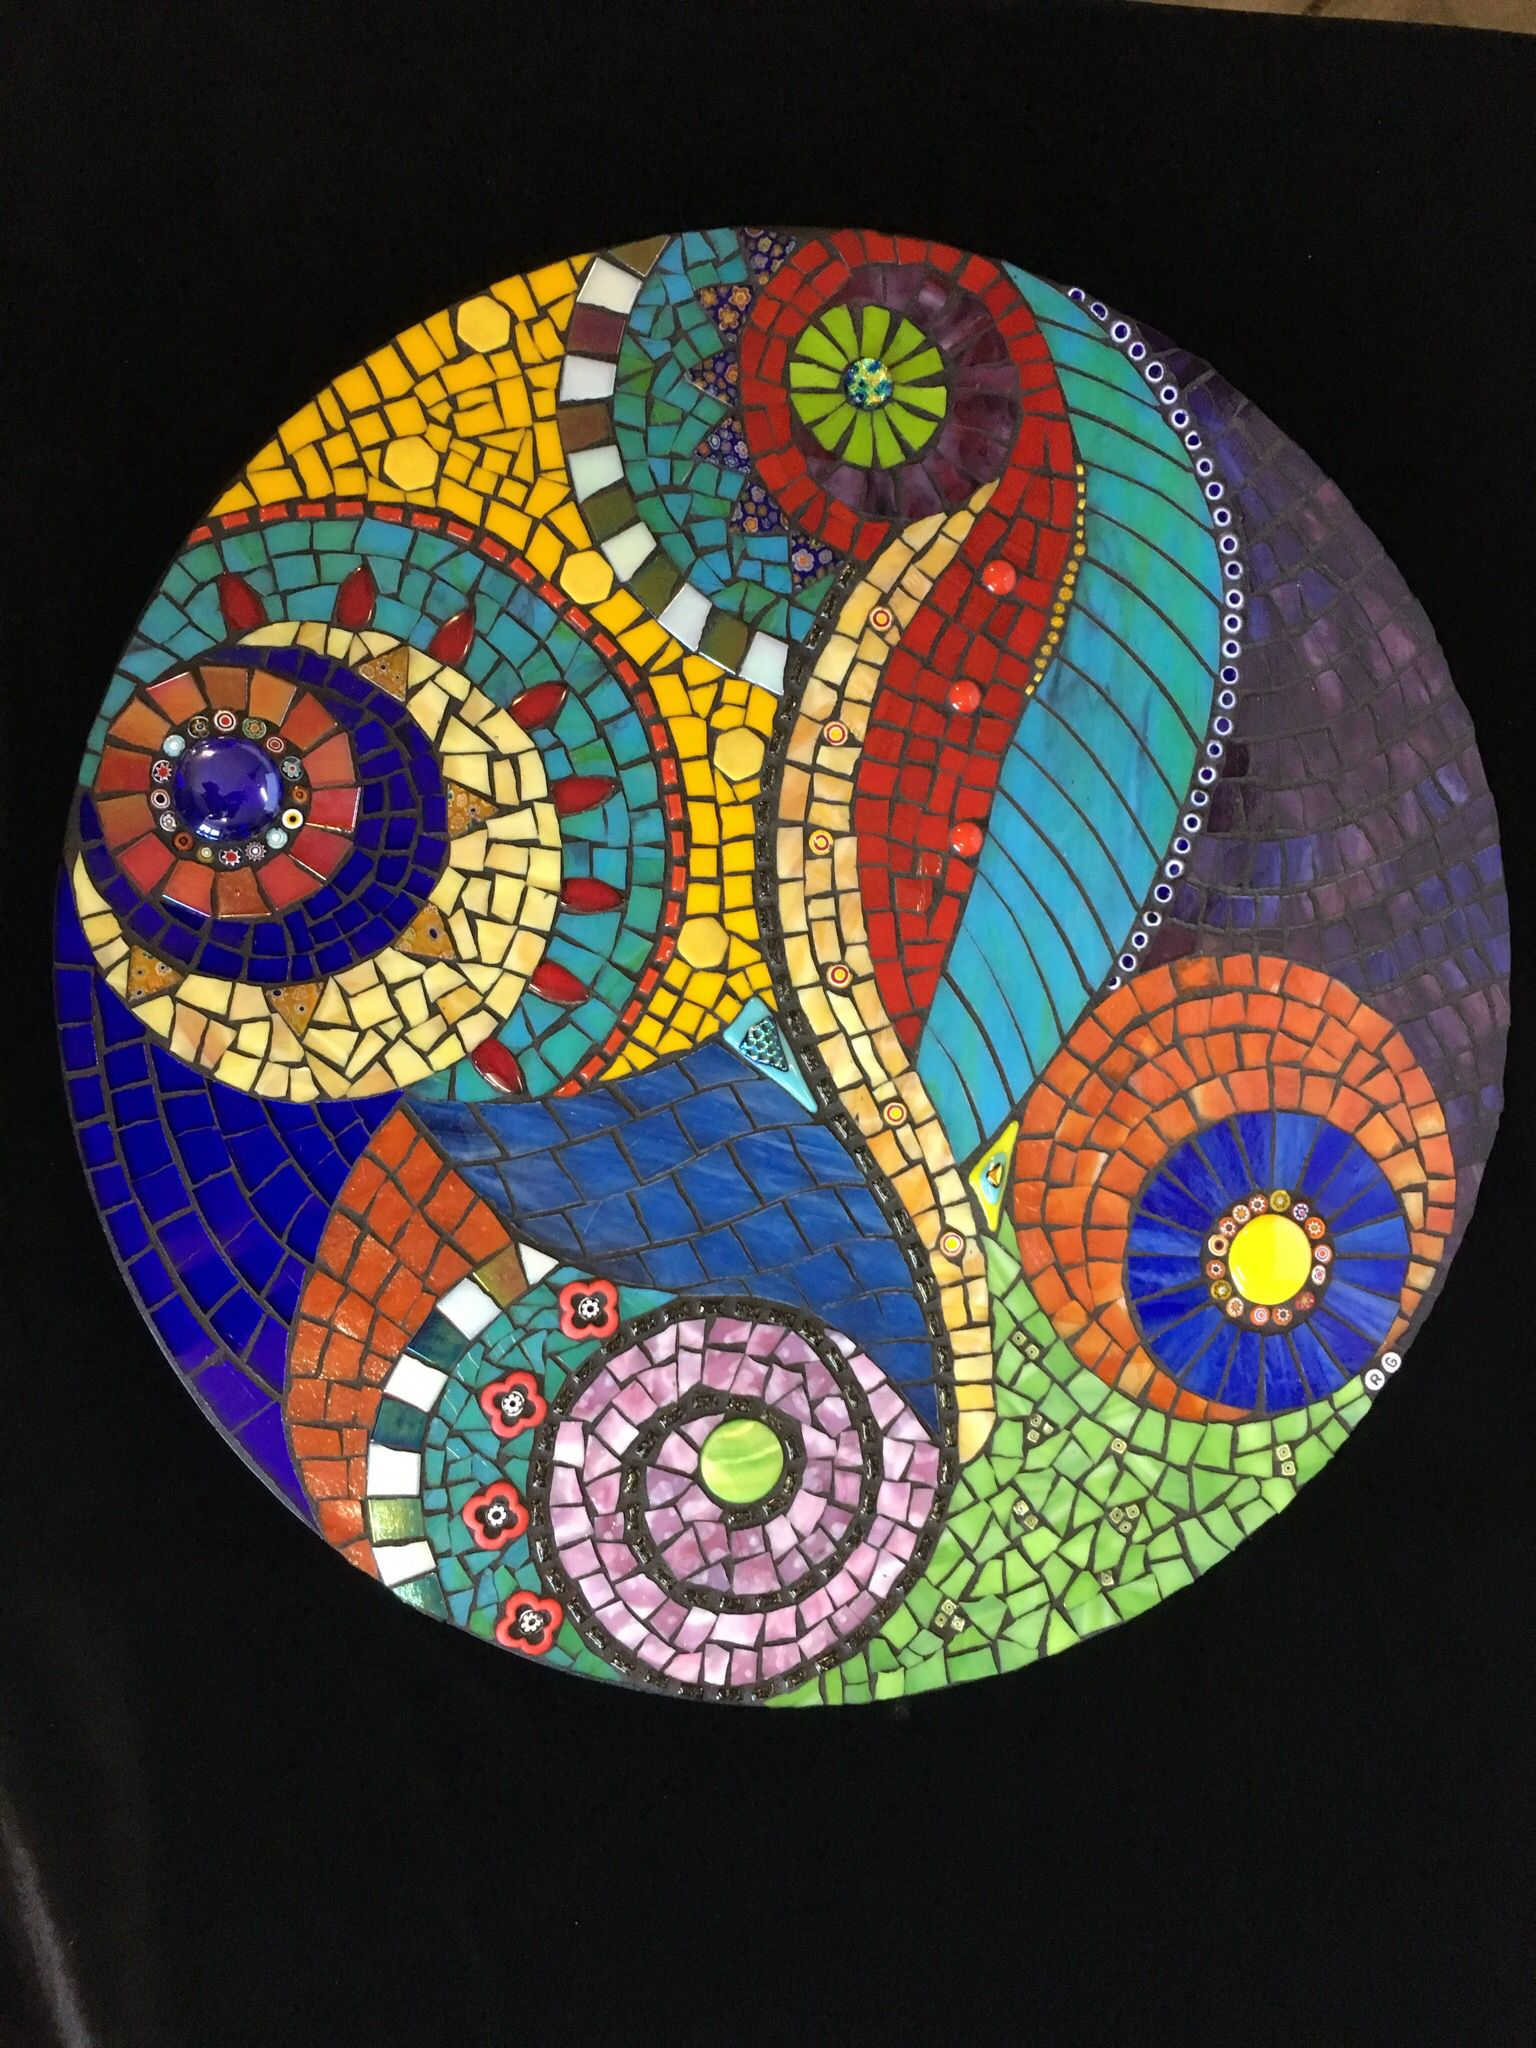 Paradise Stained Glass Mosaic Mandala Vidrio En Mosaico